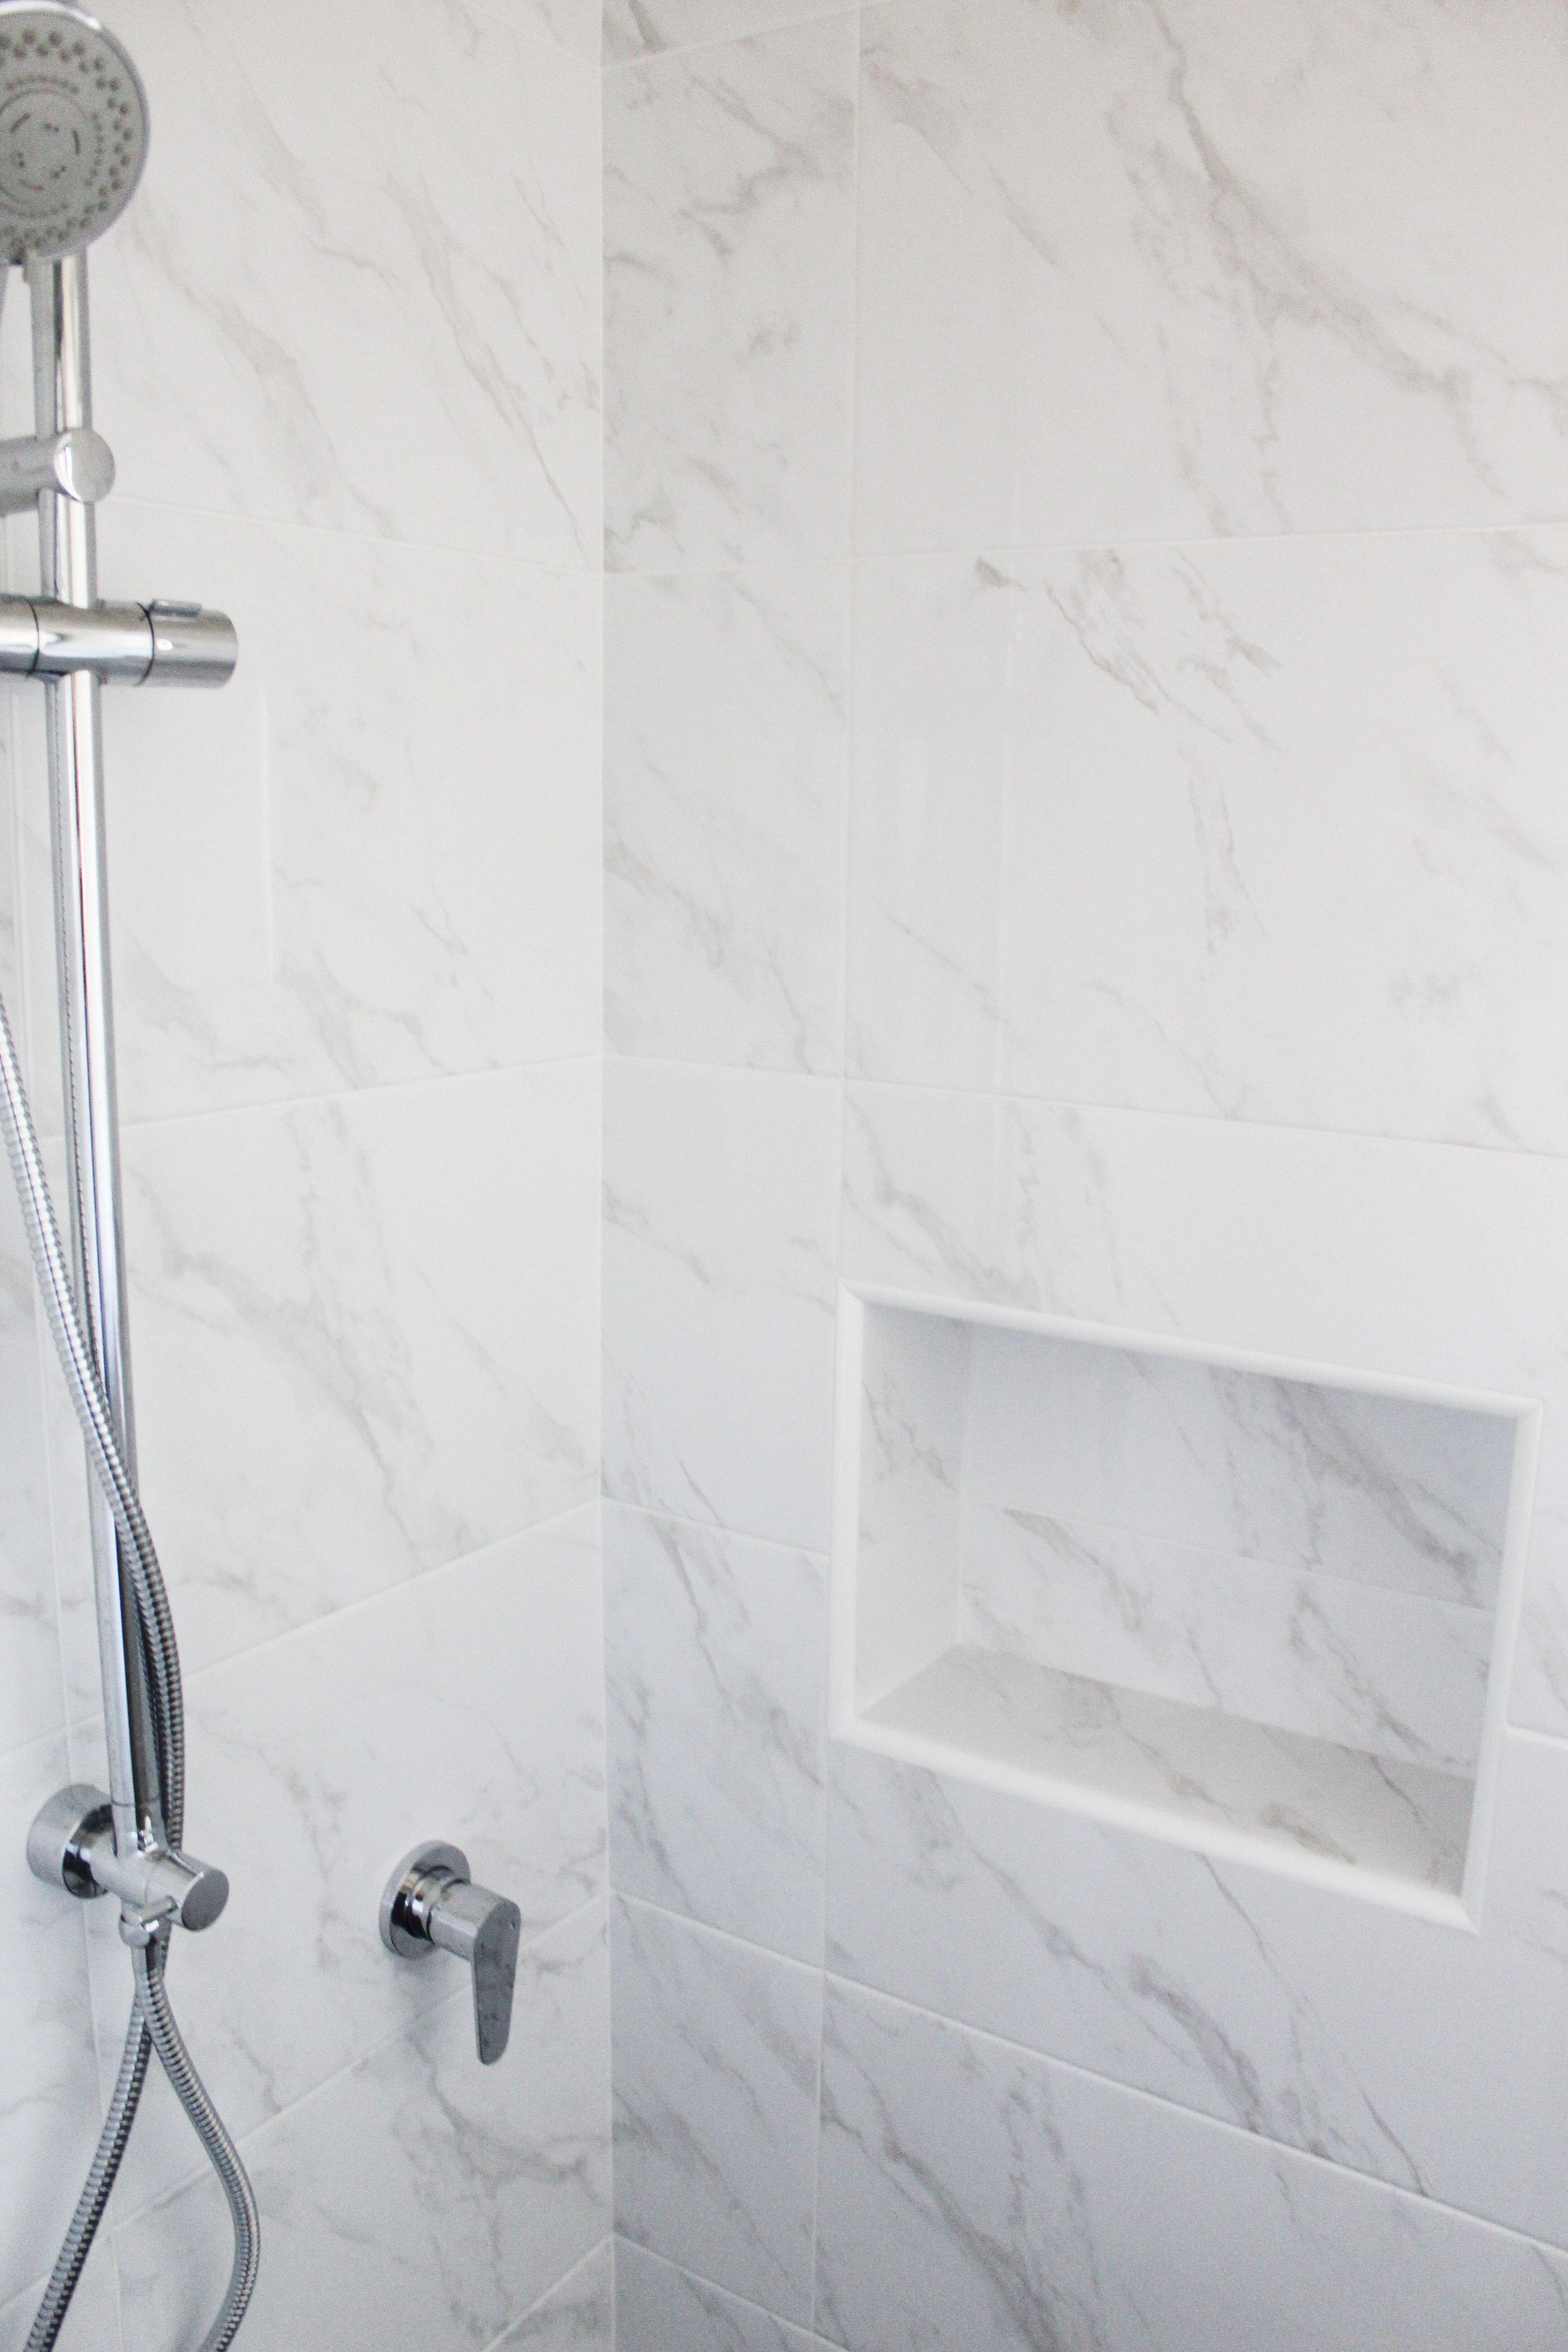 All Tiles Shower Recess Shower Niche Marble Shower Recess Shower Marble Shelf Marble Shower Shelf On The Ball Marble Showers Carrara Bathroom Marble Bathroom